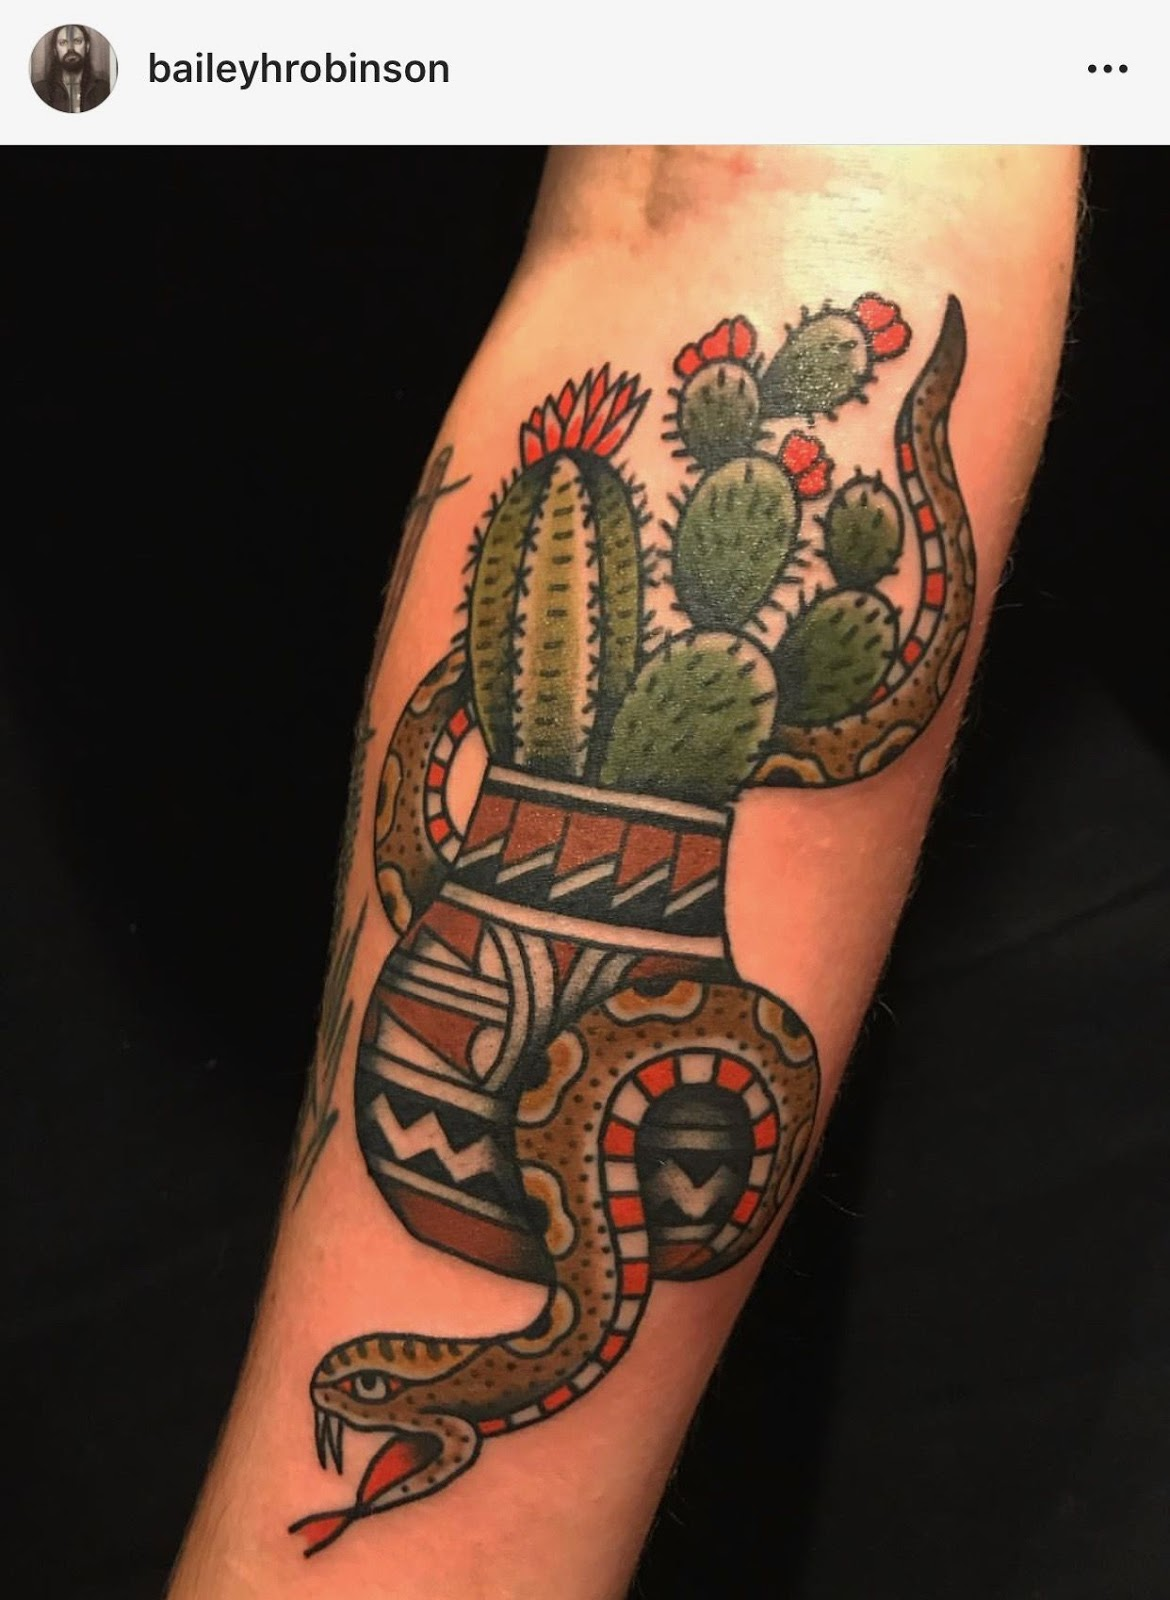 Small Simple Cactus Tattoo Designs (79)